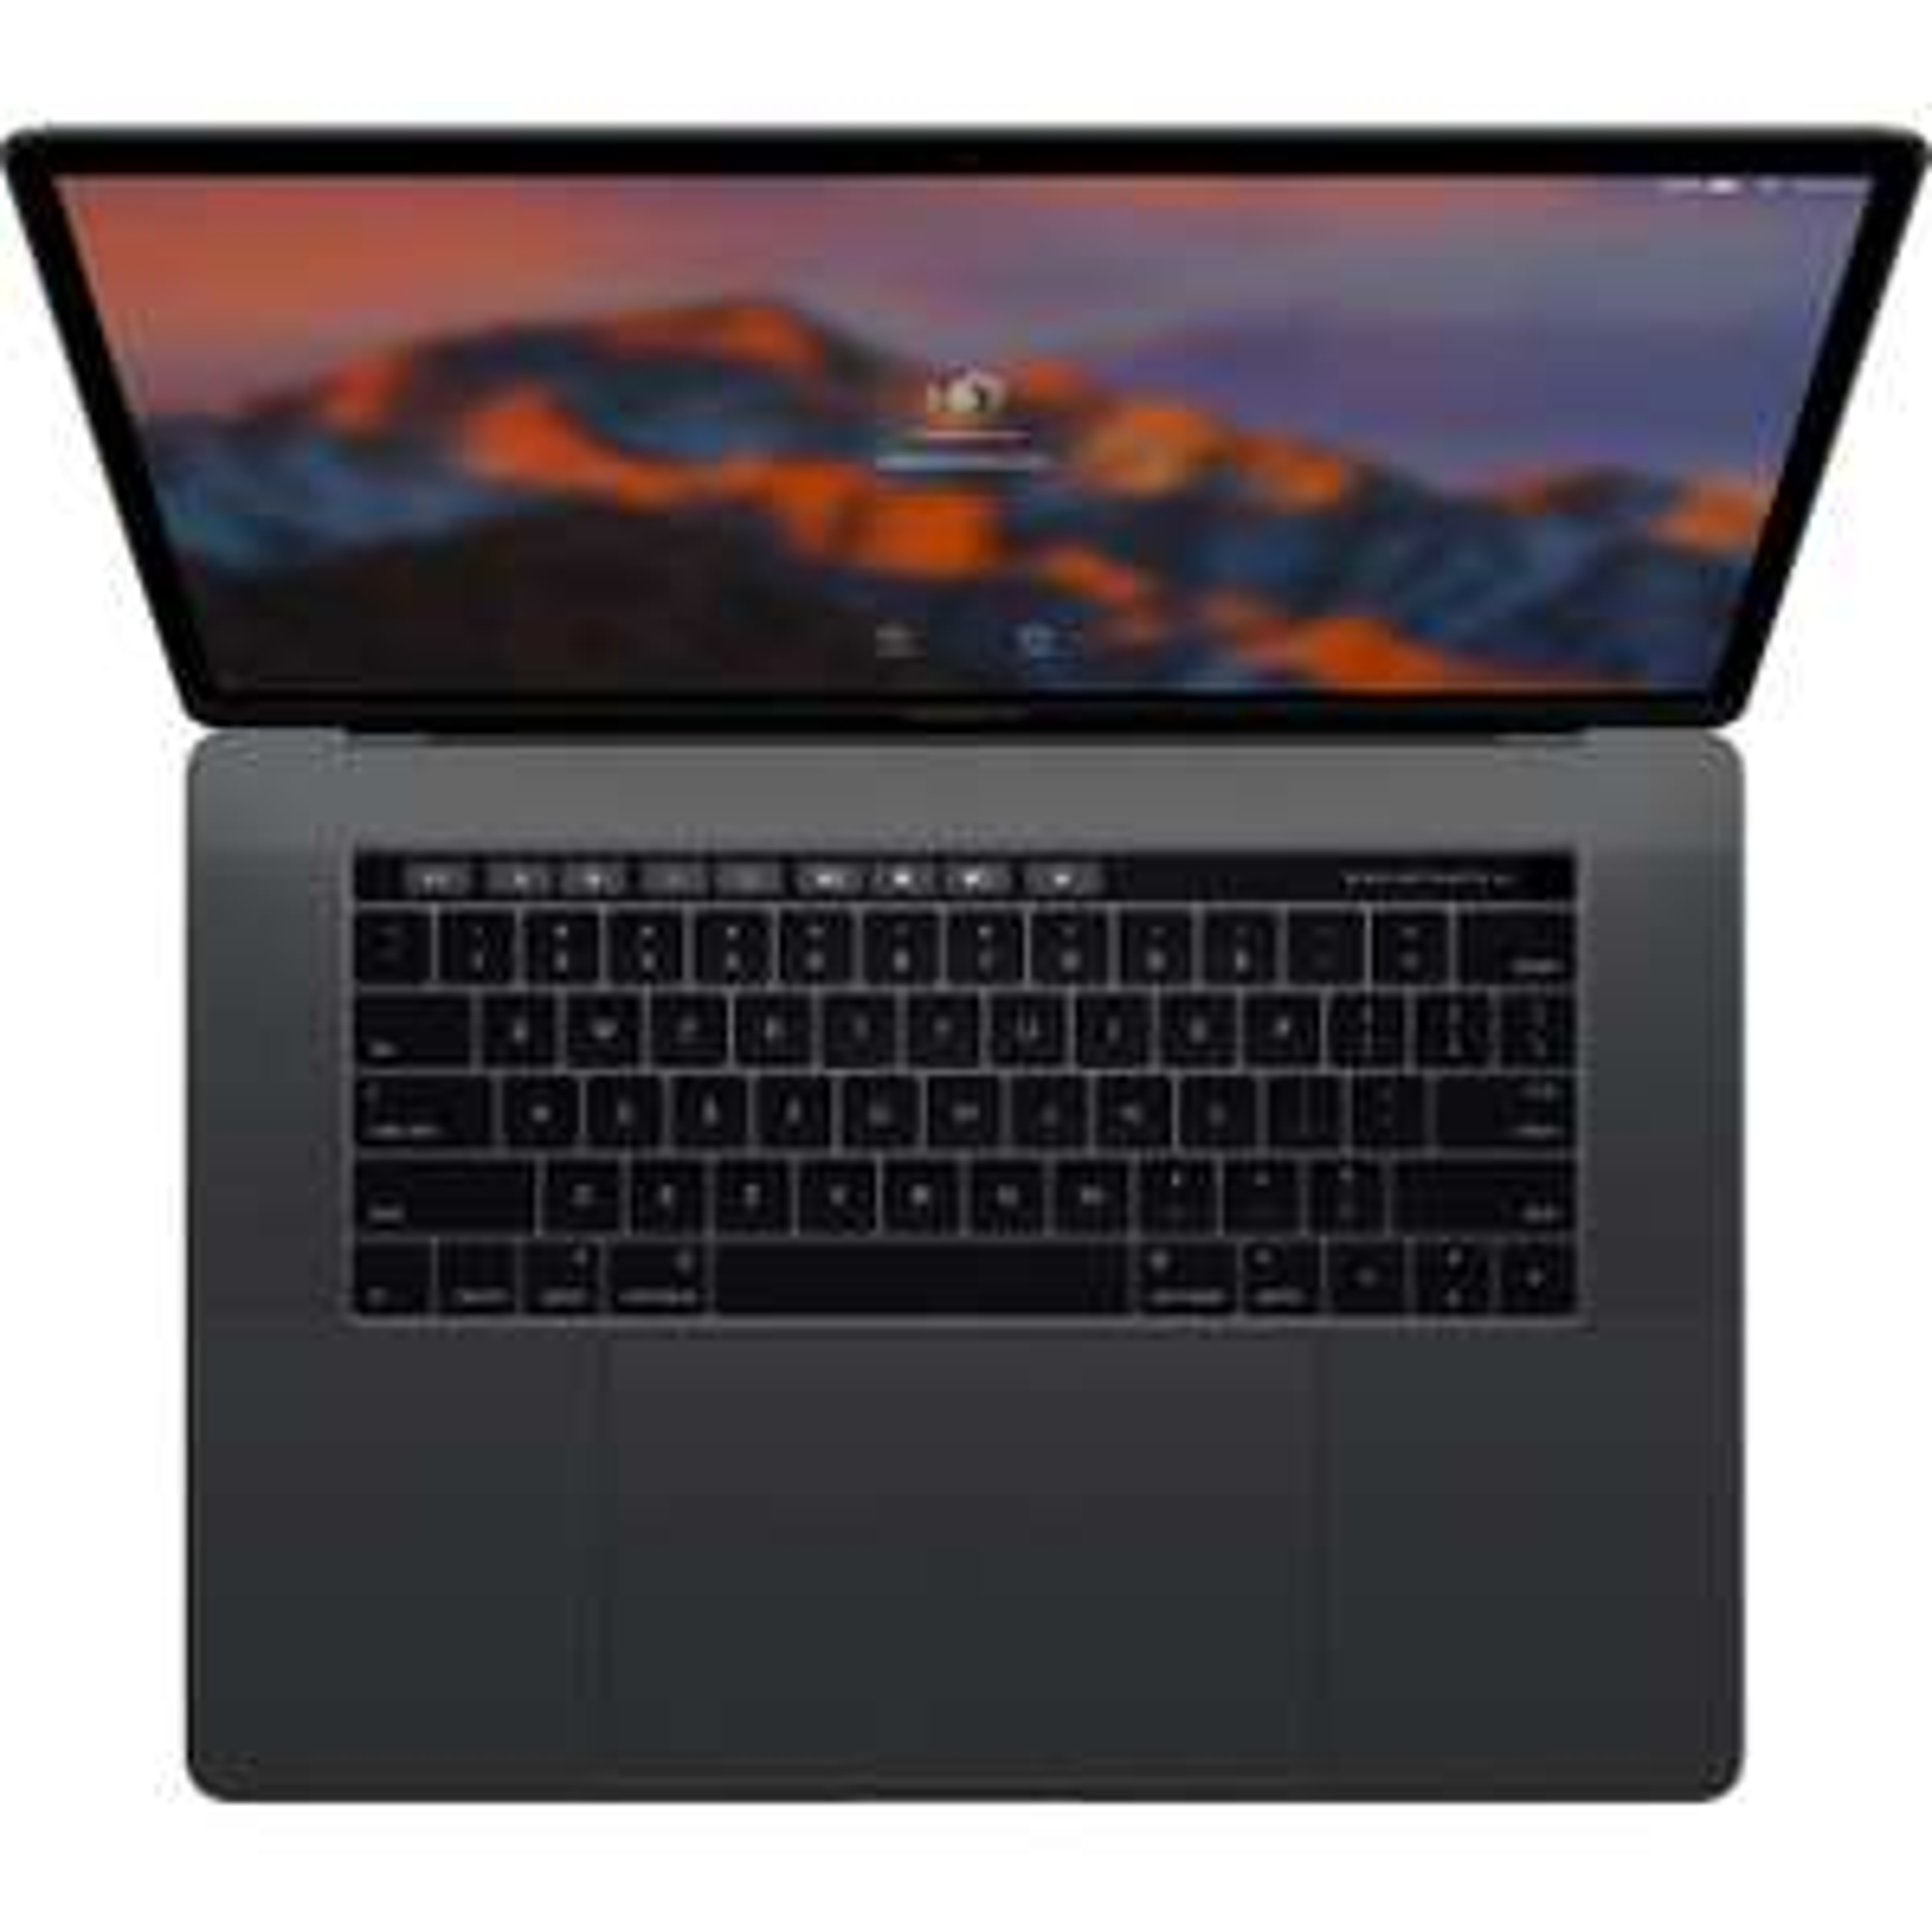 "PC portable 15.5"" Apple Macbook Pro - i7, 16 Go RAM, 256 Go SSD, Radeon Pro 450 2 Go, Touch Bar, QWERTZ"